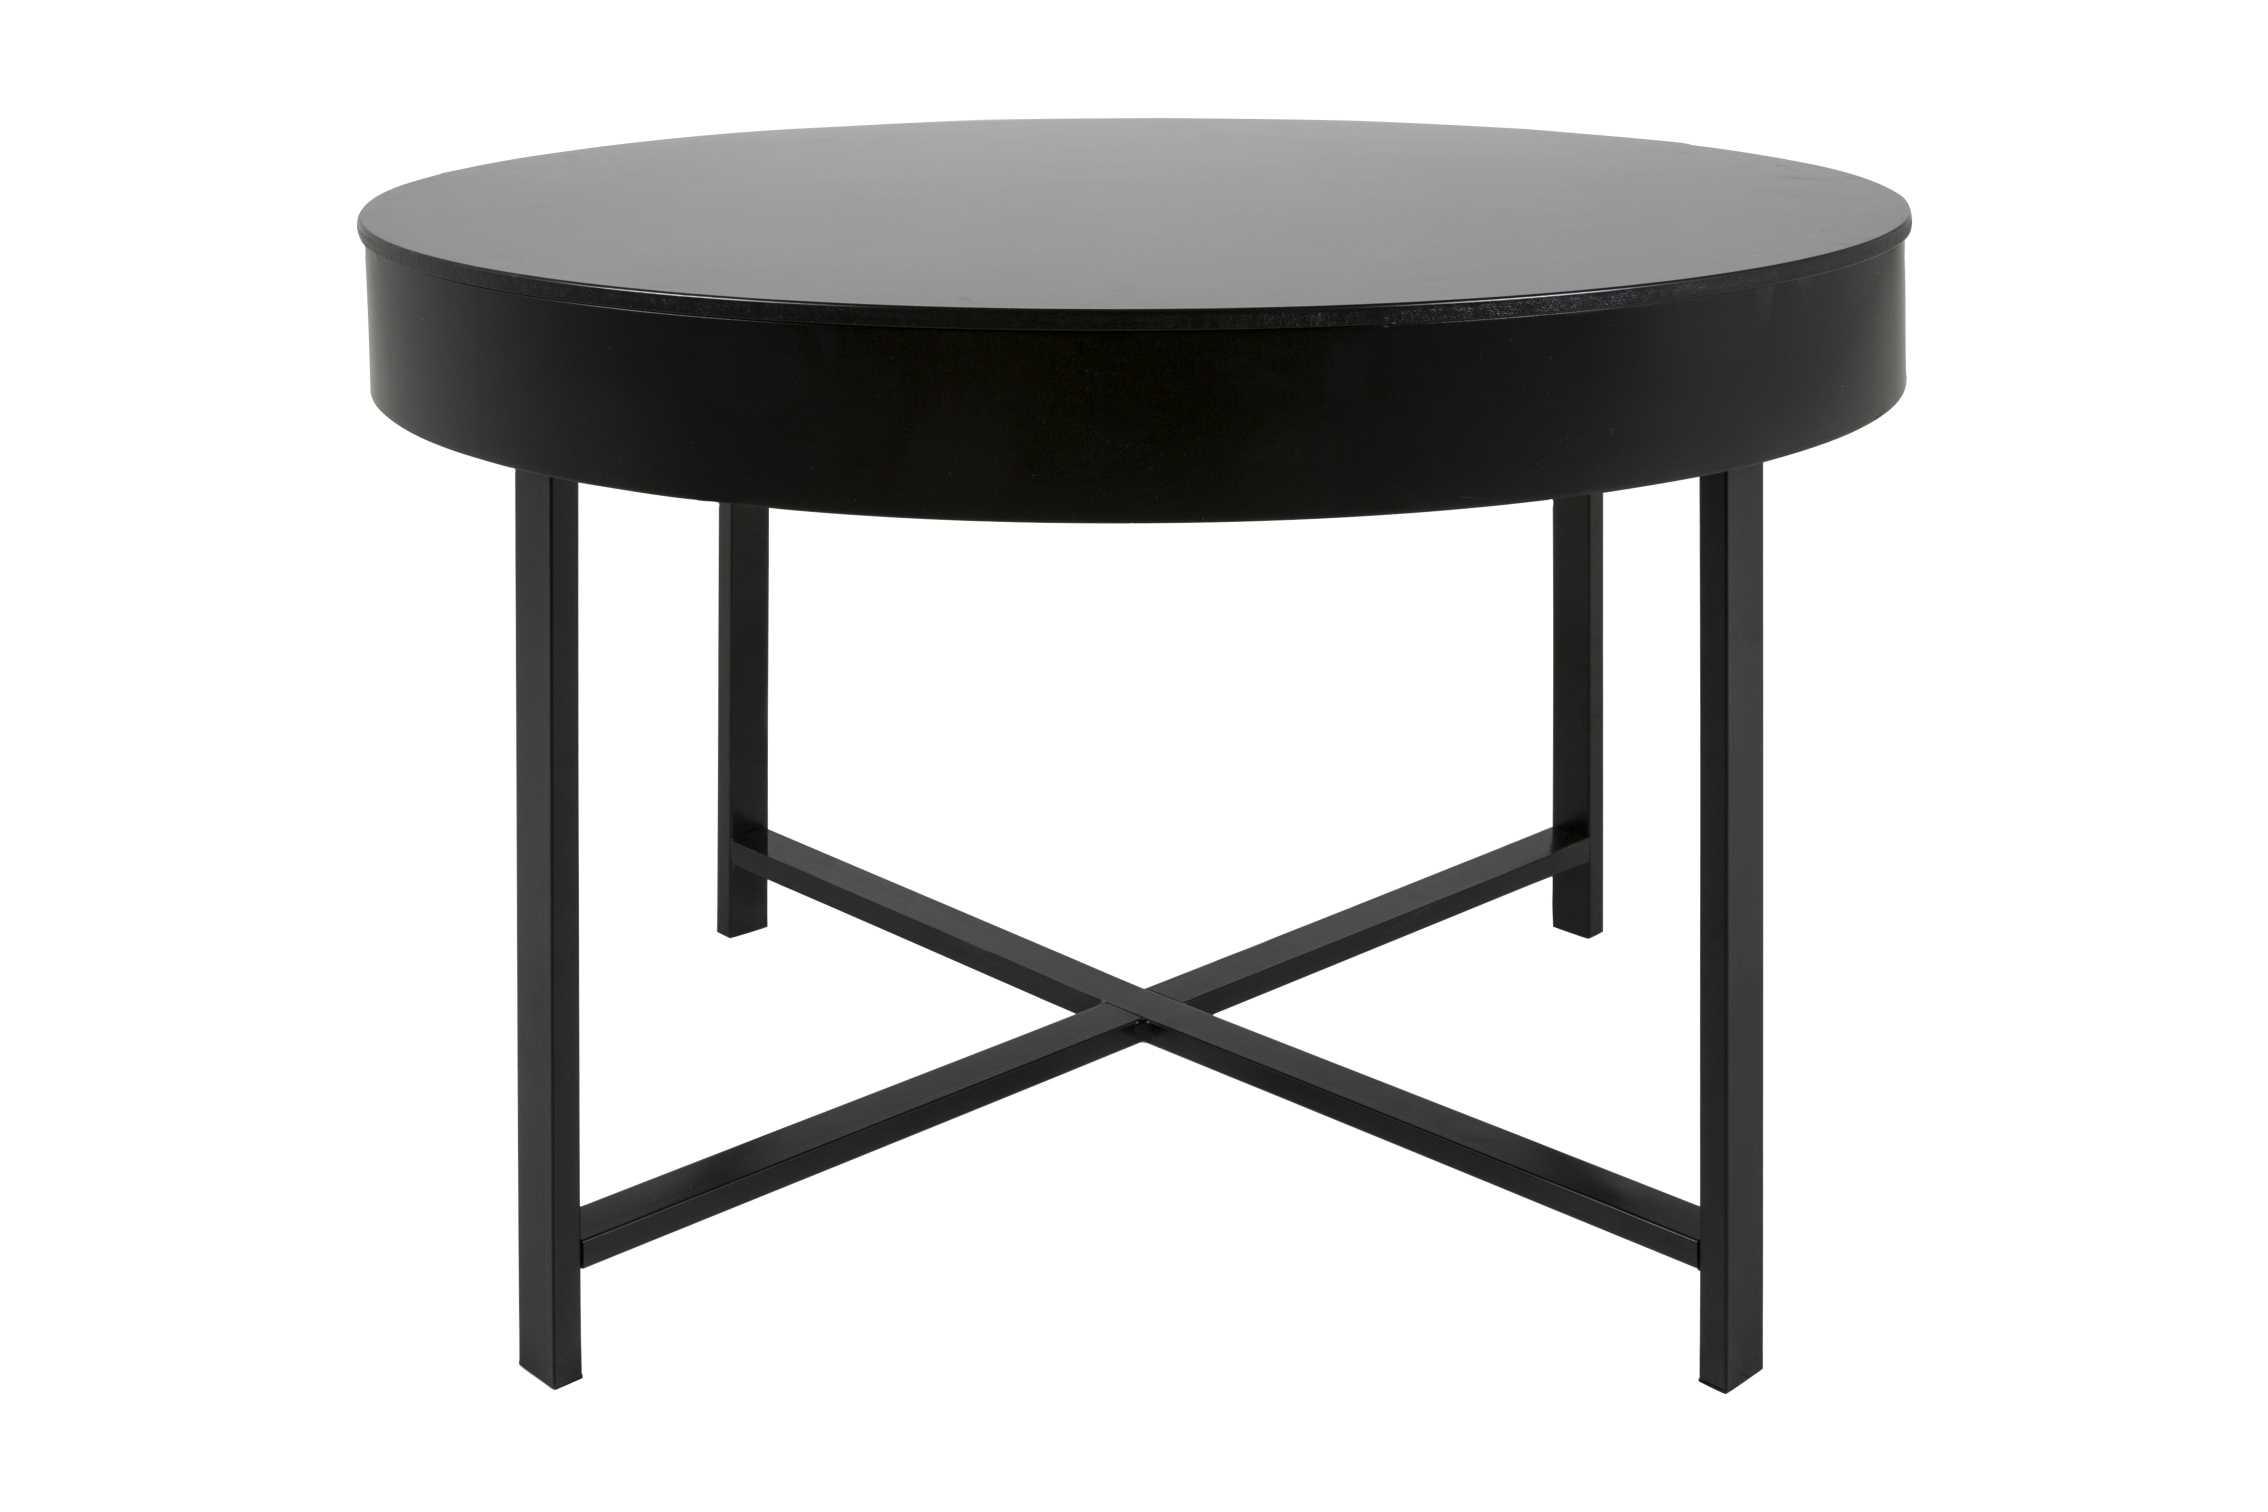 Molly sofabord med aftagelig top - sort fra canett fra boboonline.dk